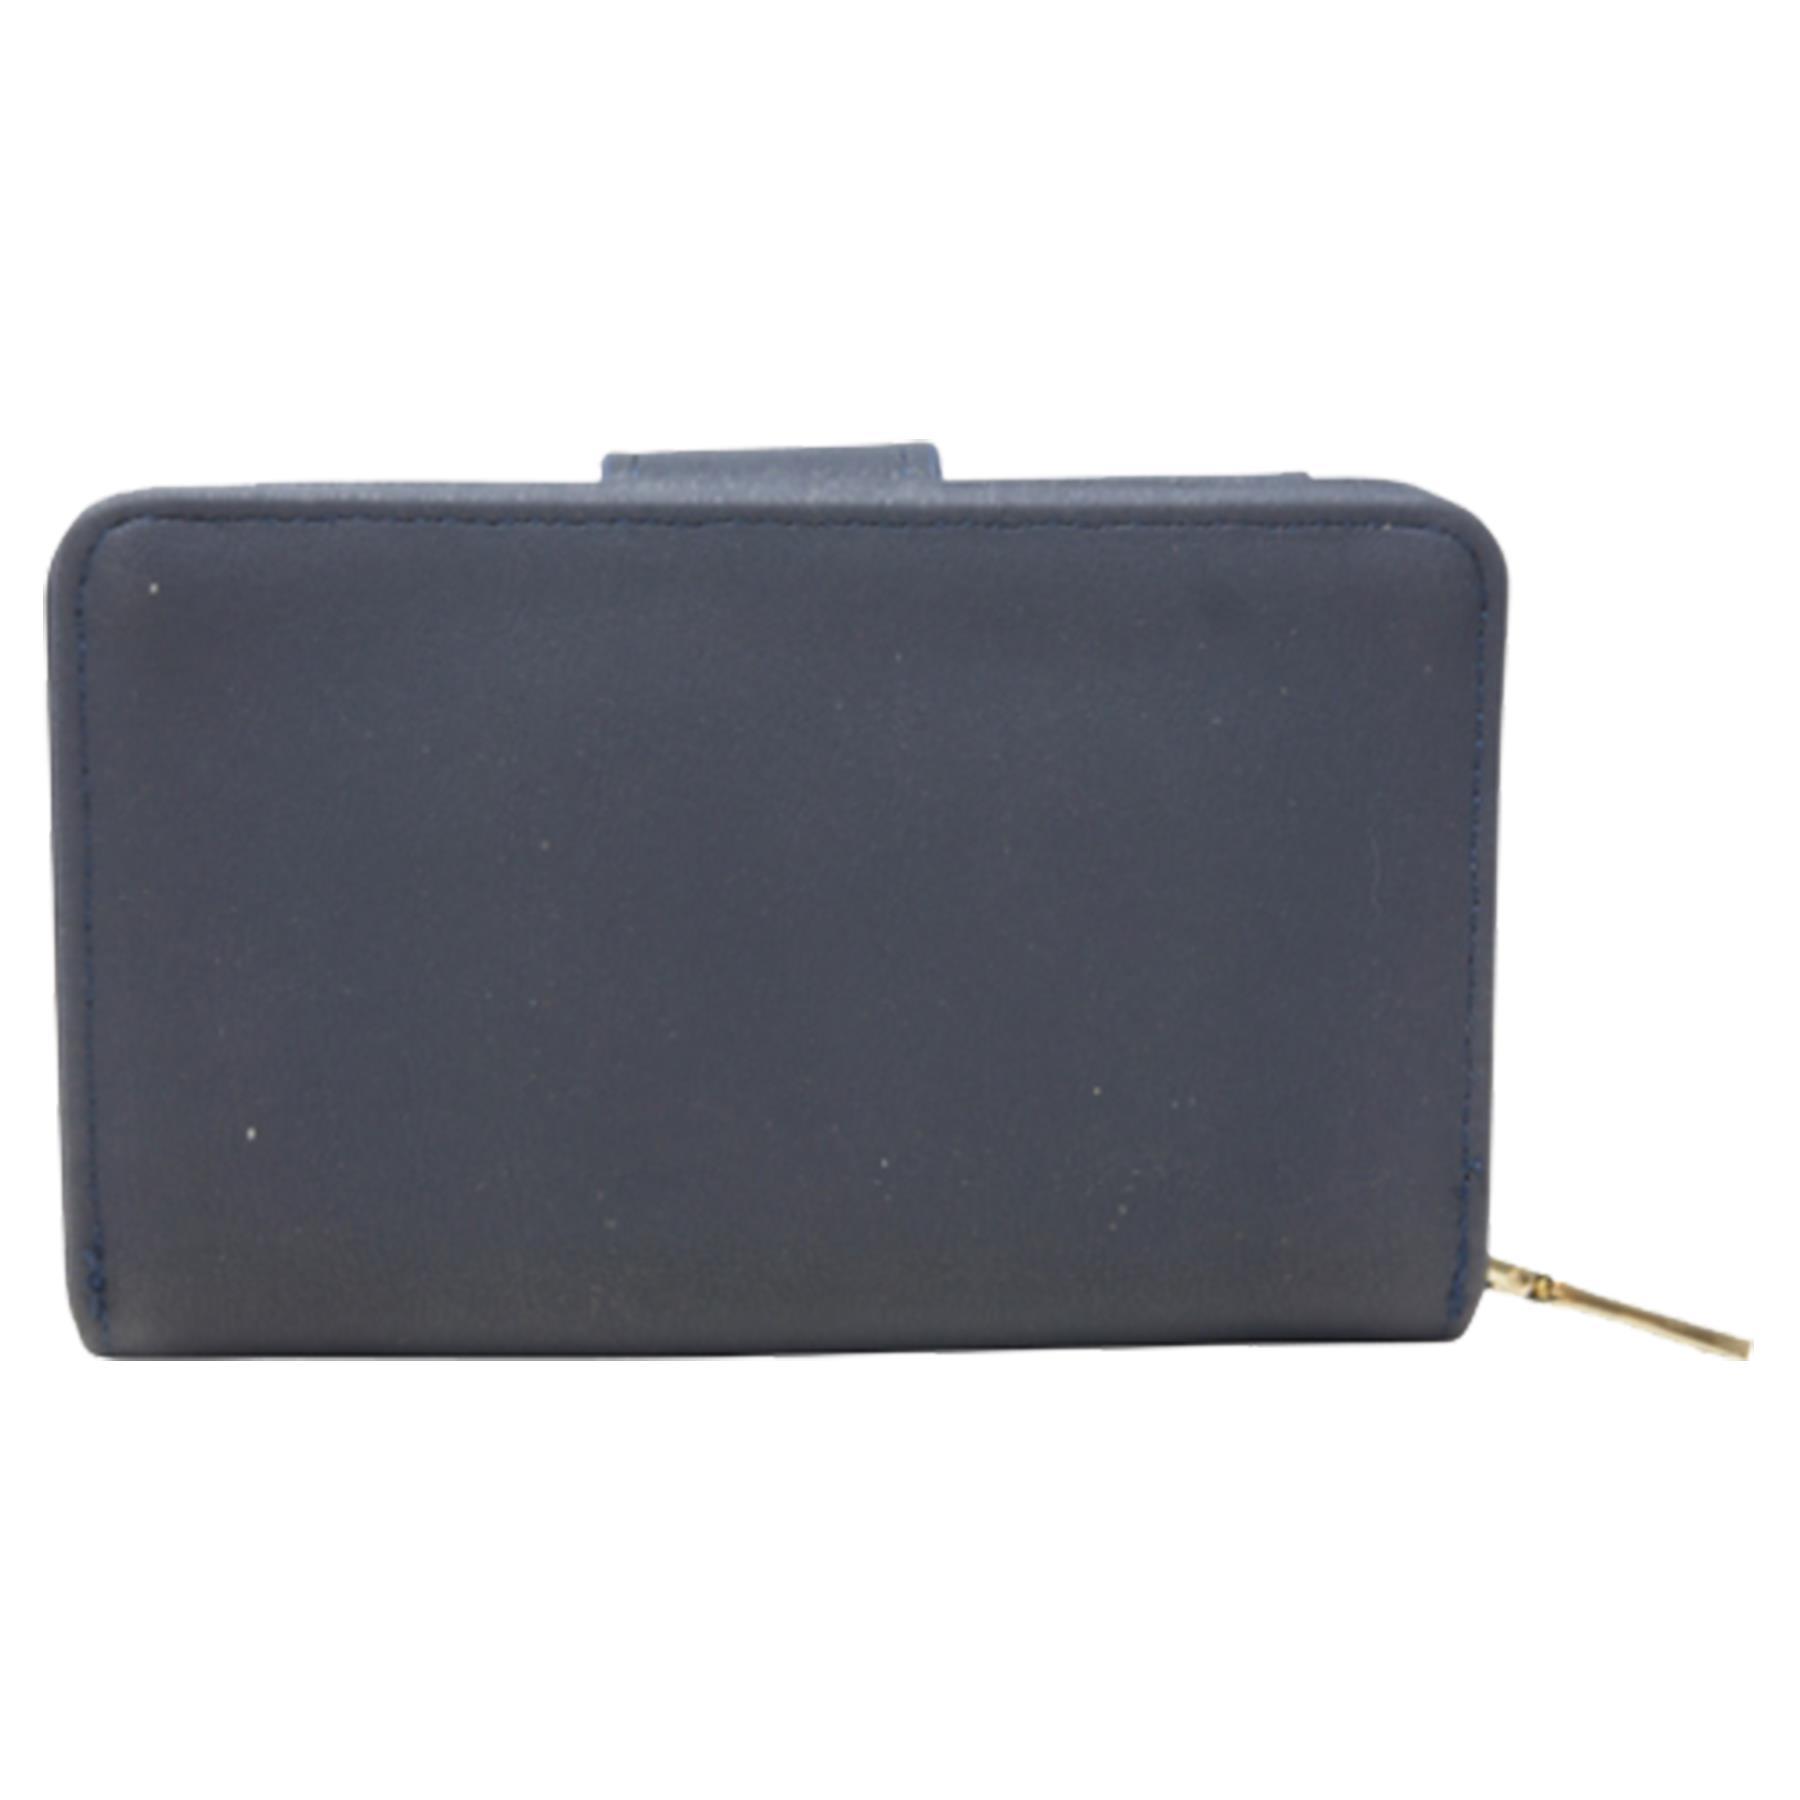 New-Ladies-Card-Slots-Zipped-Pocket-Faux-Leather-Basic-Wallet-Purse thumbnail 7